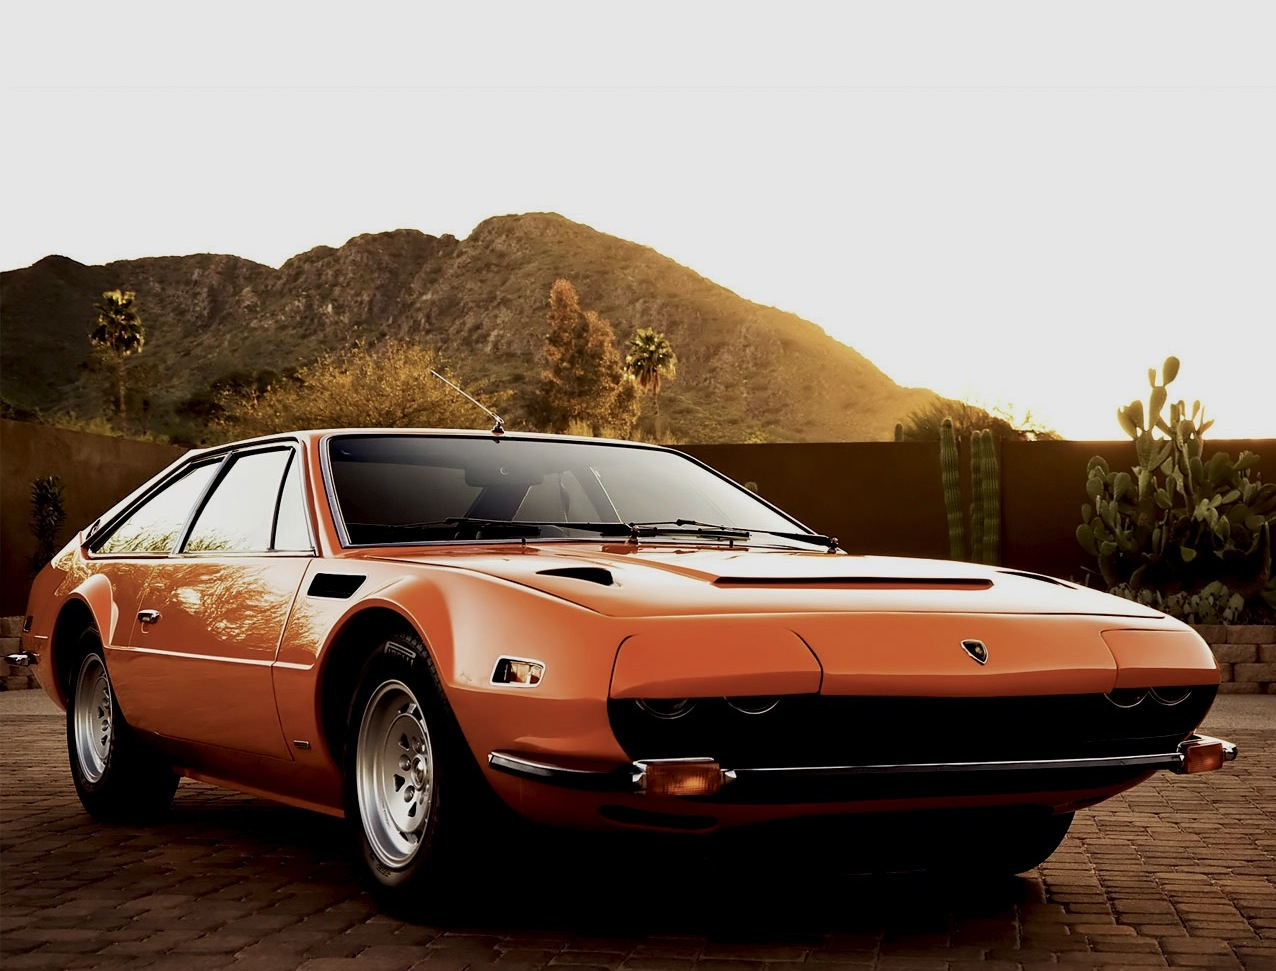 Lamborghini Jarama High Quality Background on Wallpapers Vista